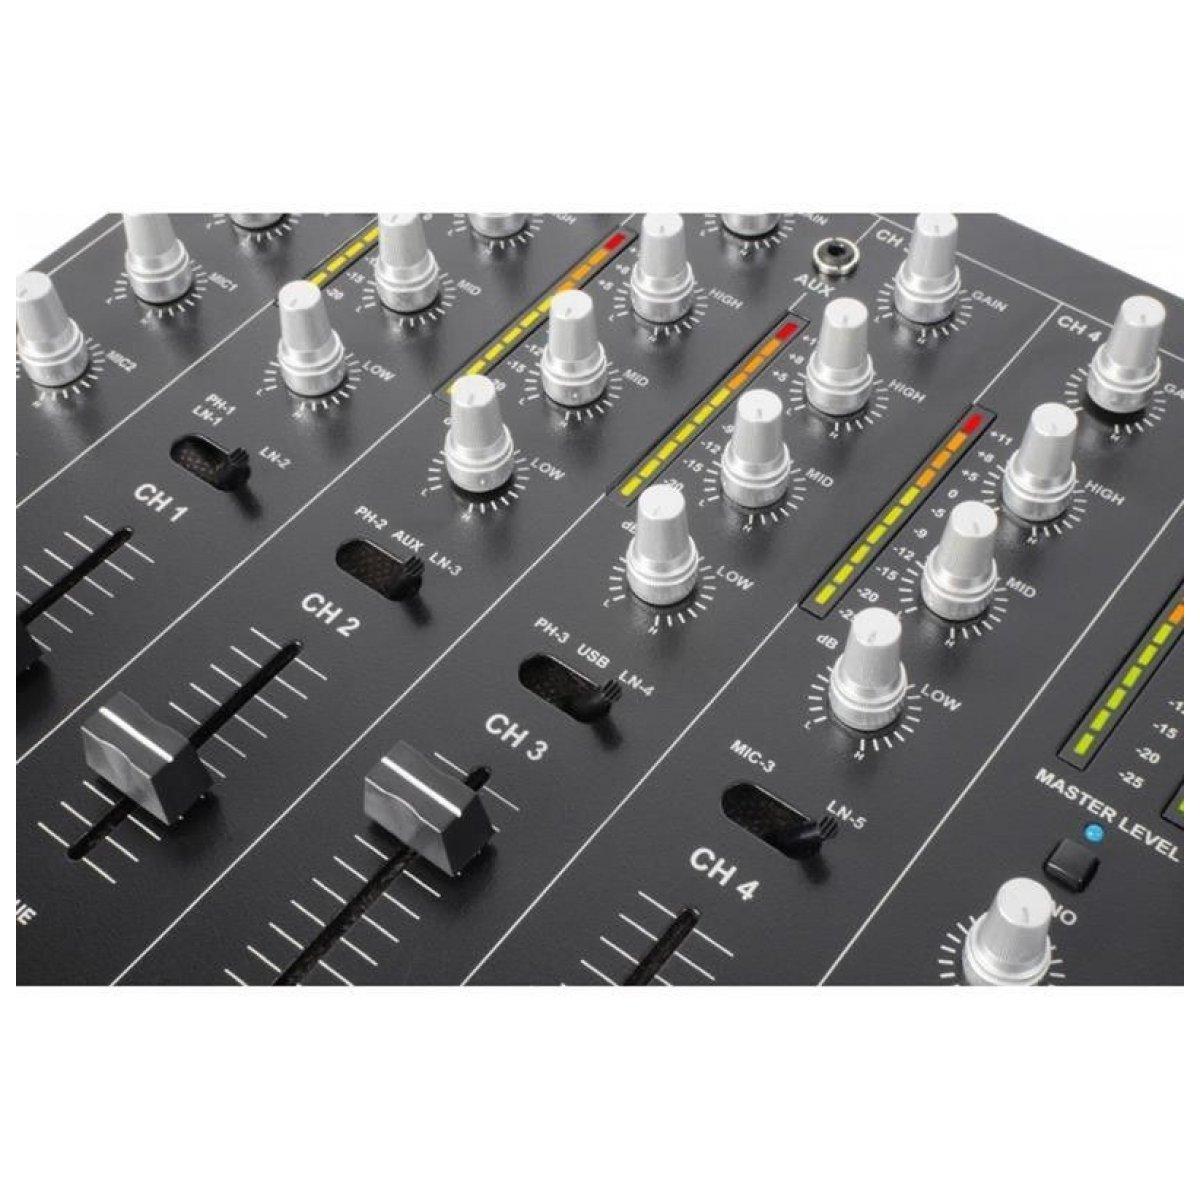 Skytec STM 7010 Mixer 4 Ch DJ Mixer USB